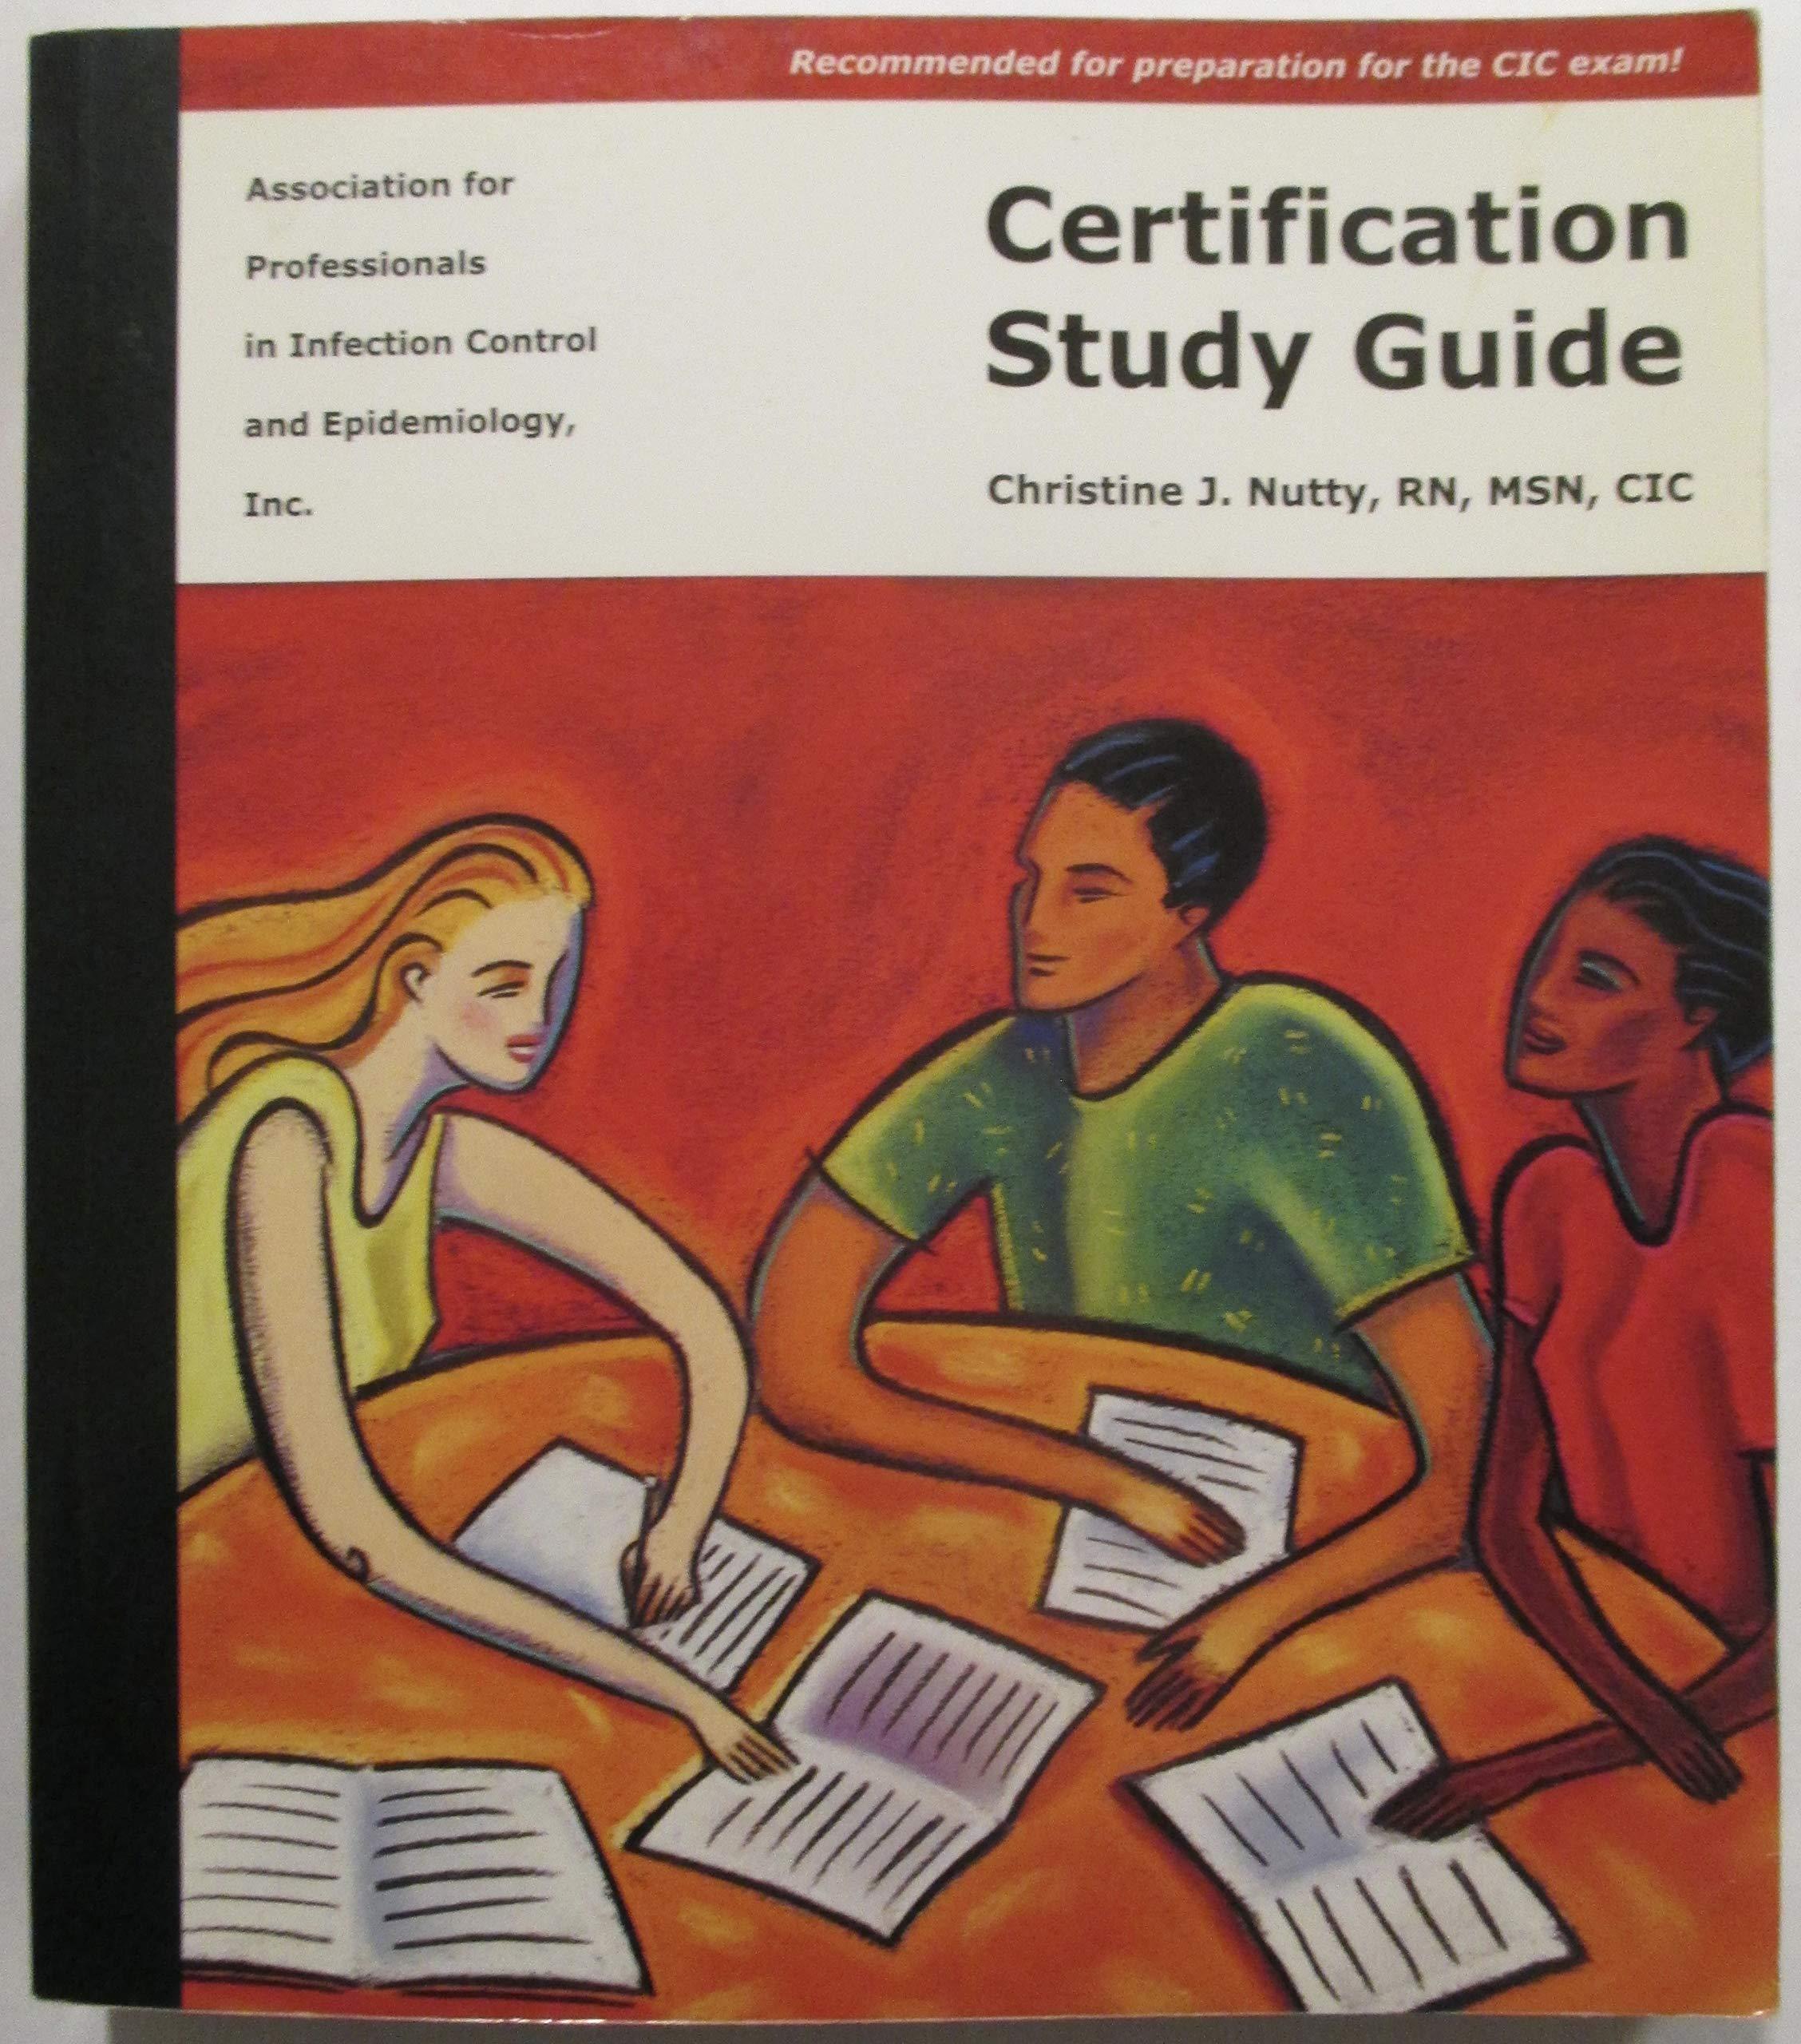 2003 Apic Certification Study Guide Christine J Nutty Amazon